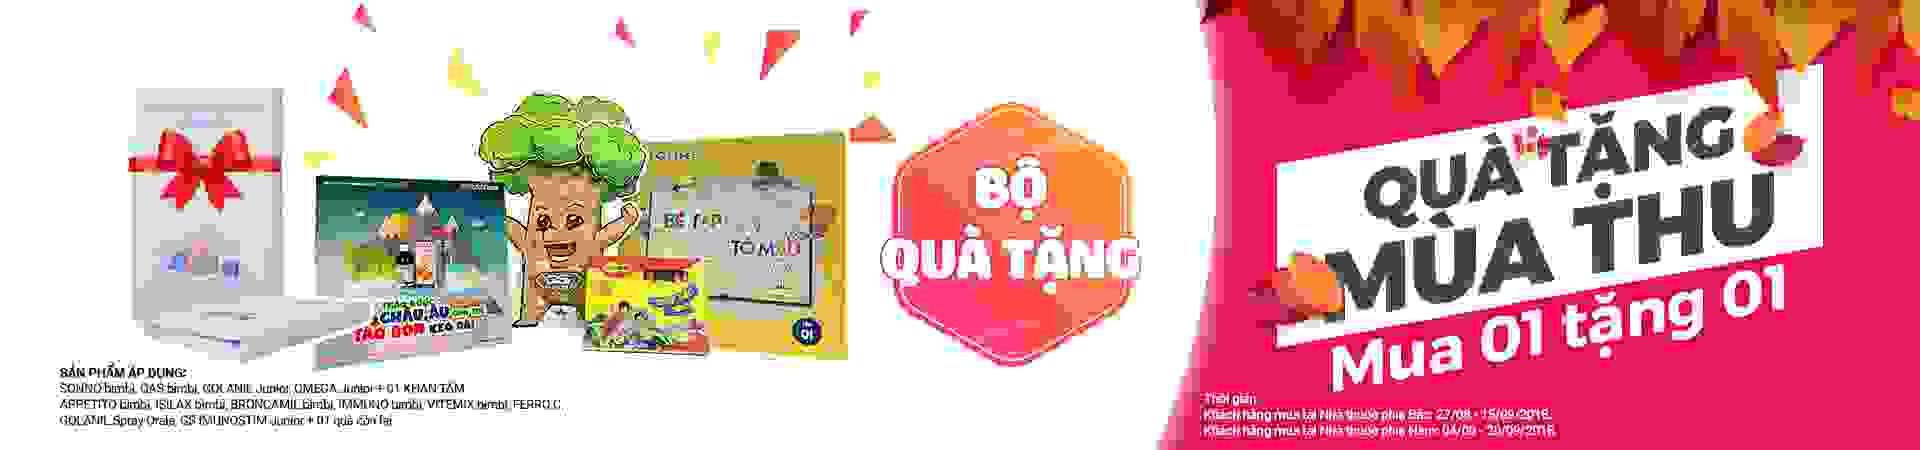 Slide show_Sonno_qua tang mua thu